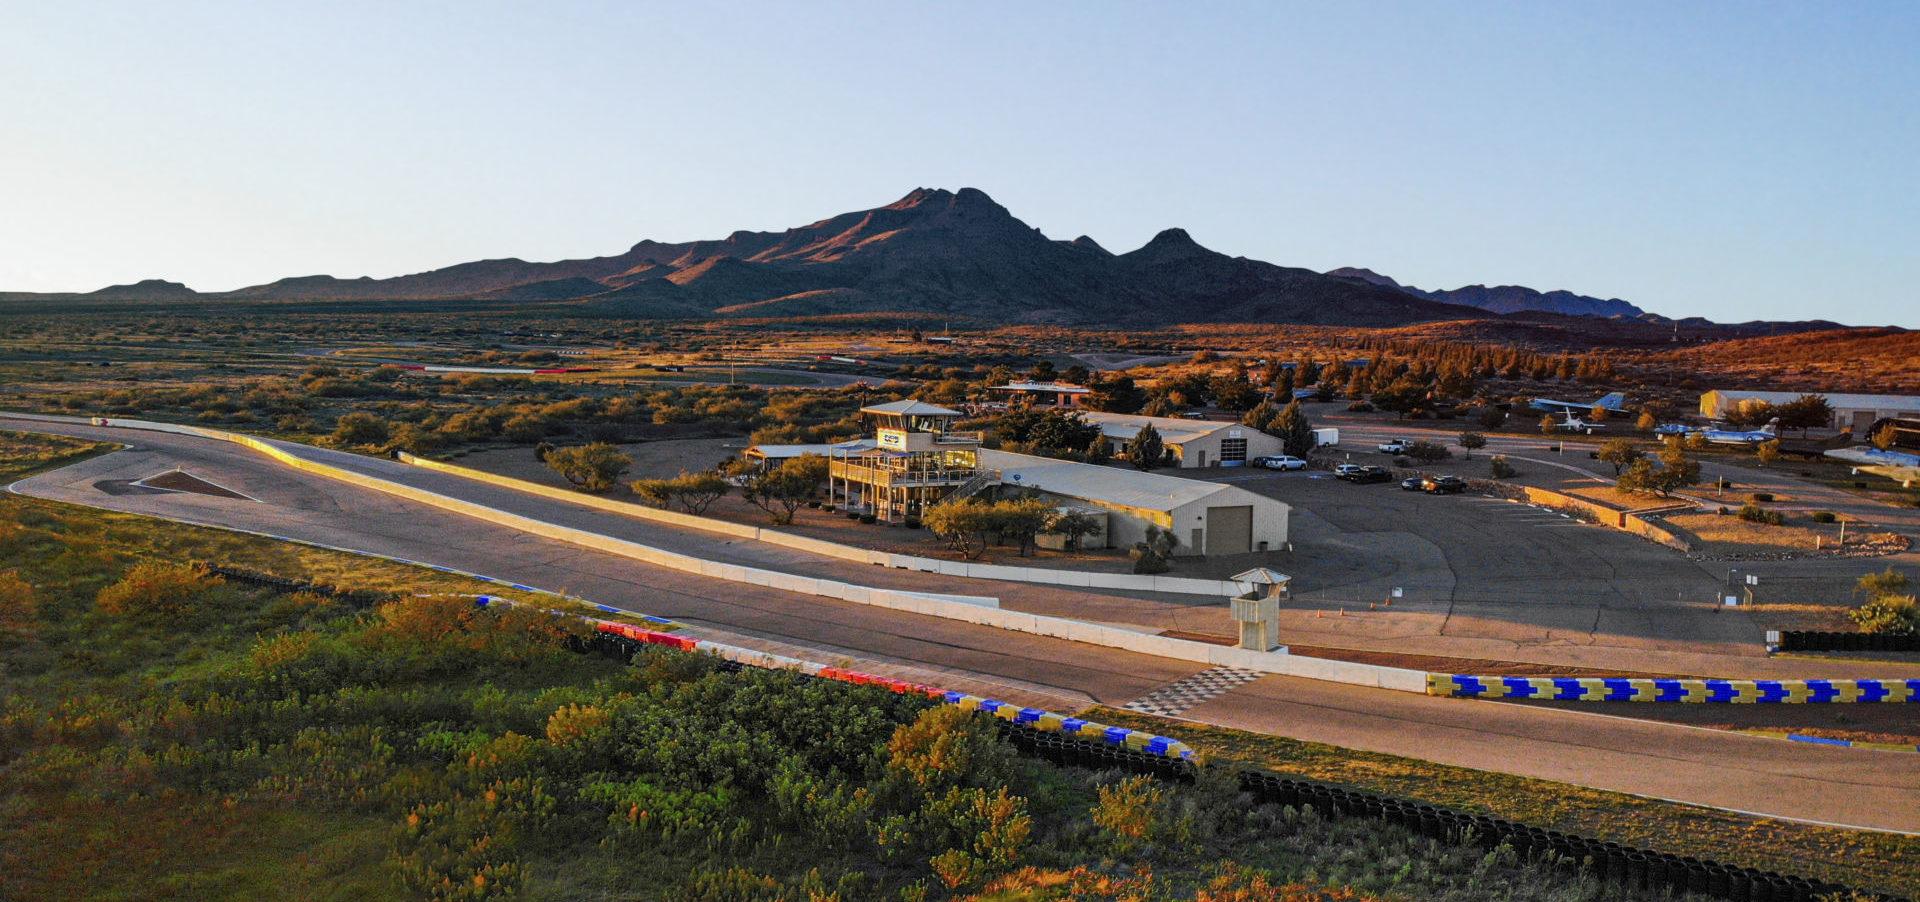 Inde Motorsports Ranch, in Willcox, Arizona. Photo courtesy Inde Motorsports Ranch.